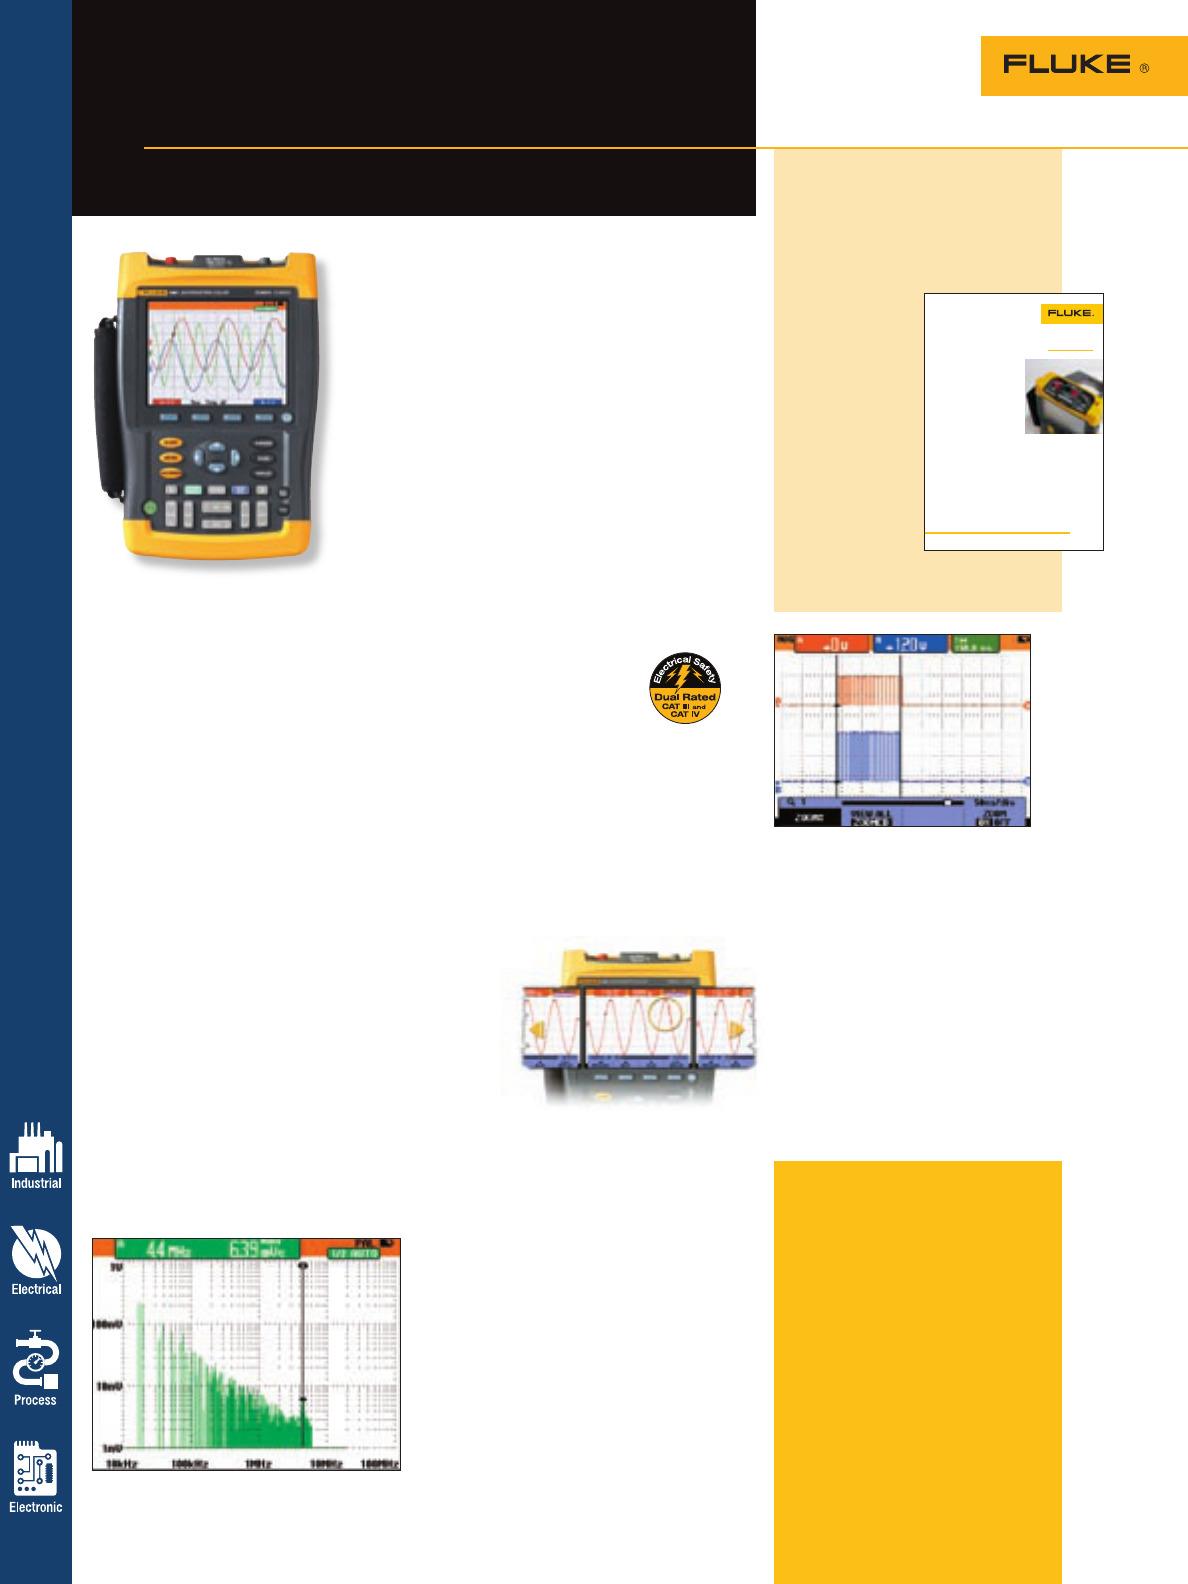 hight resolution of accessories catalog 2017 fluke electronics digikeyfluke 744 3 wire rtd diagram 19